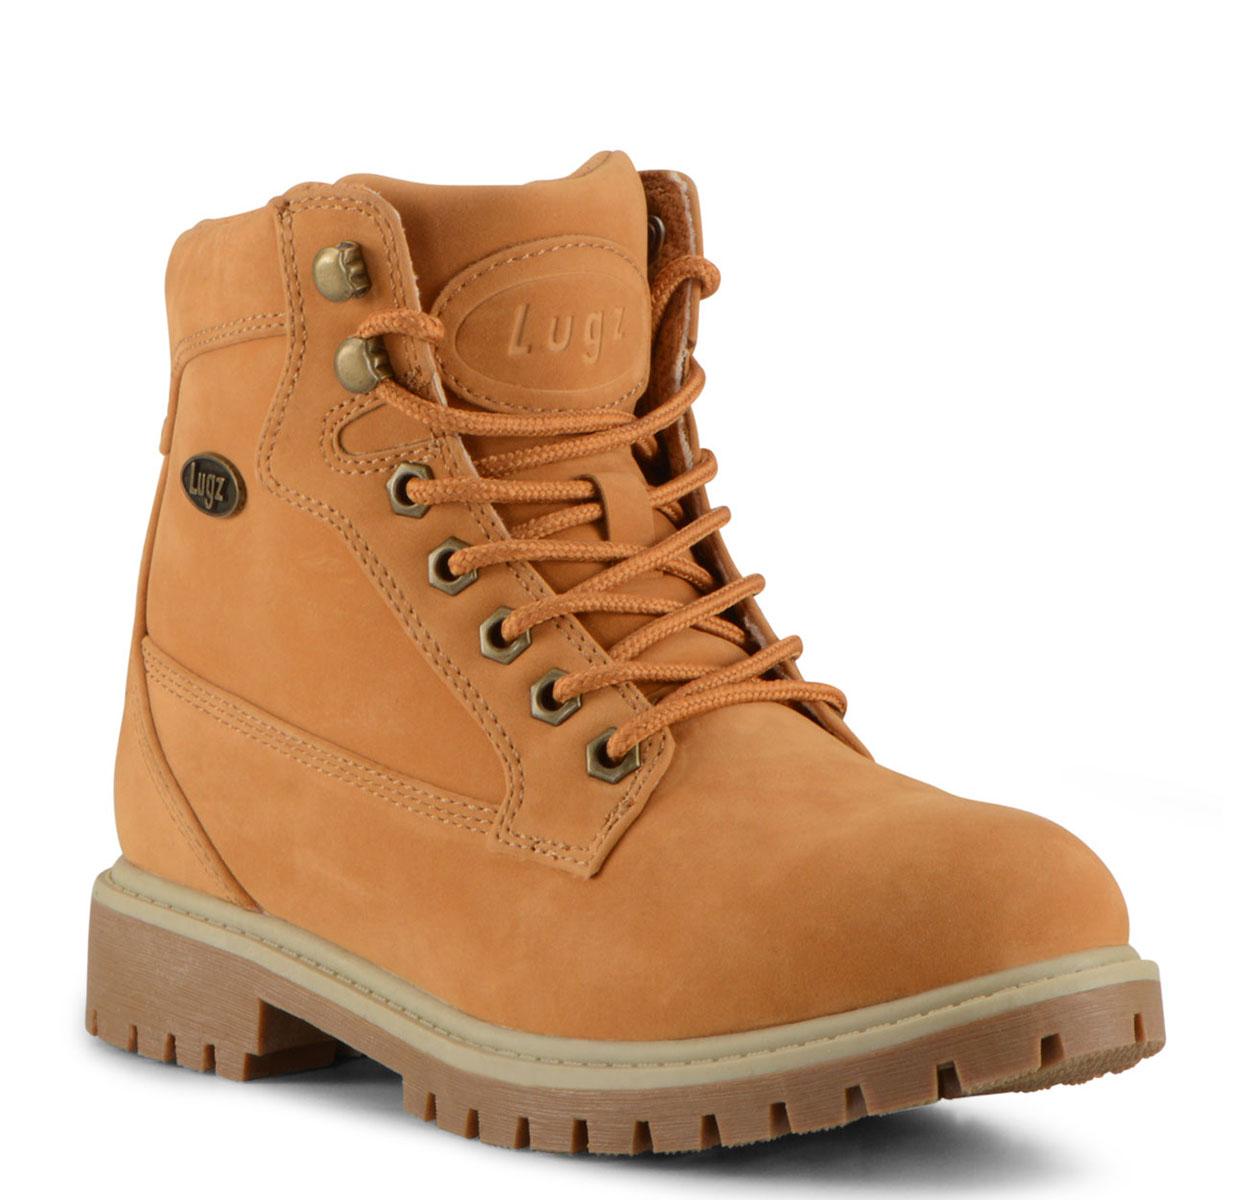 Women's Mantle HI 6-Inch Boot (Choose Your Color: Golden Wheat/Cream/Gum, Choose Your Size: 7.0)